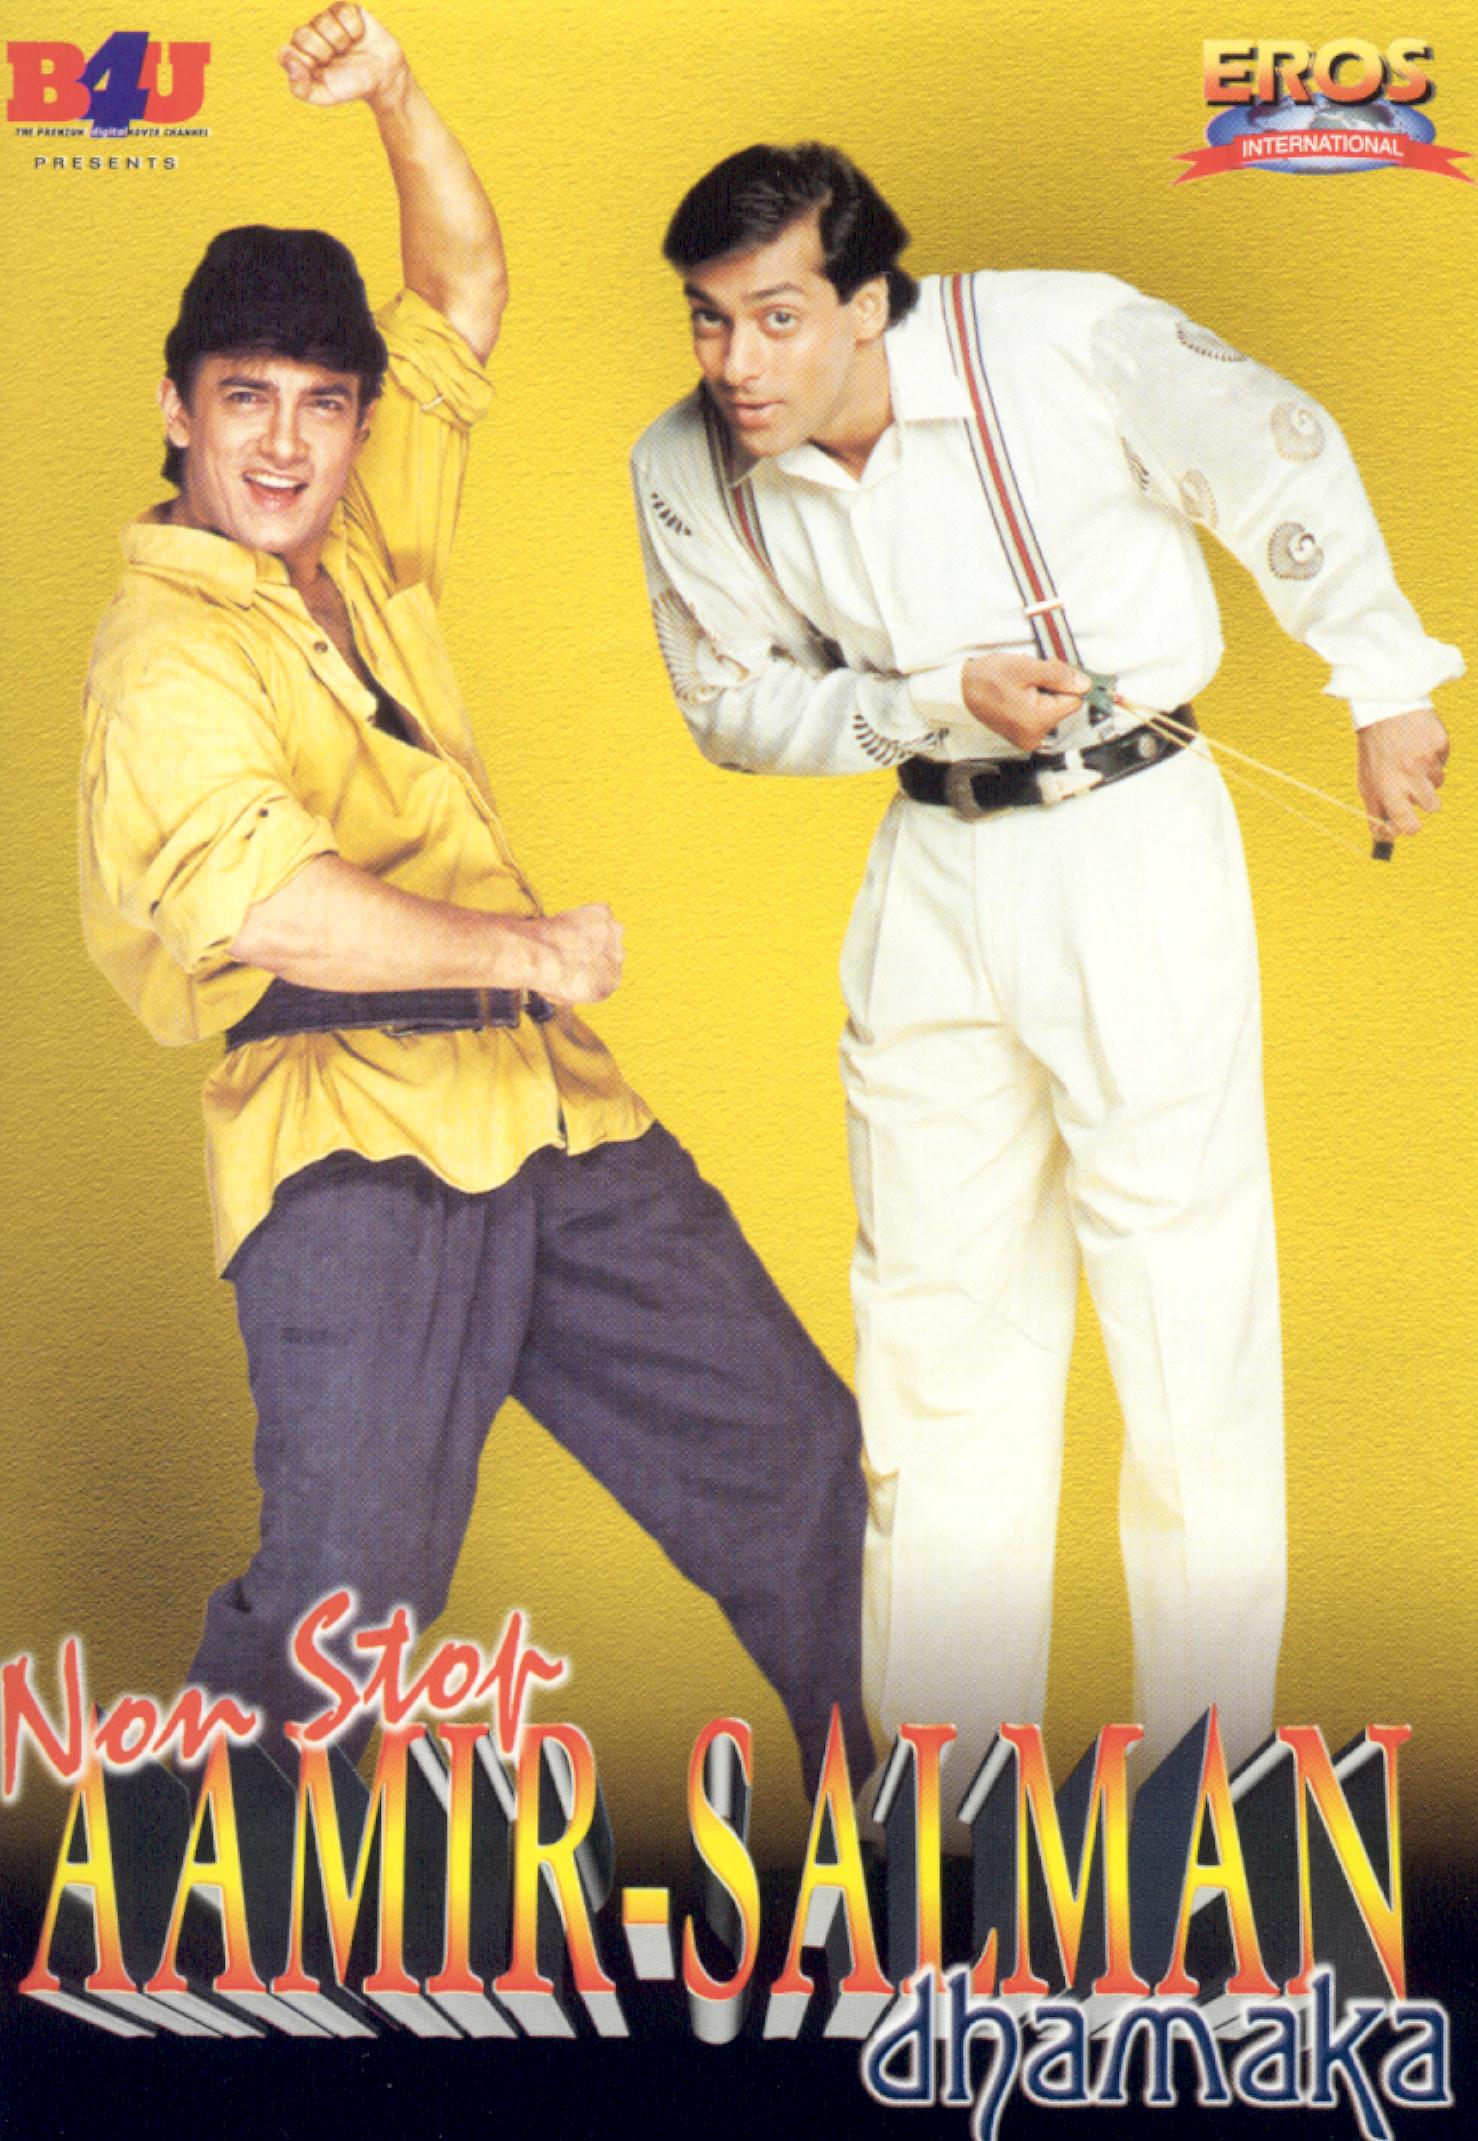 Non-Stop Aamir-Salman Dhamaka